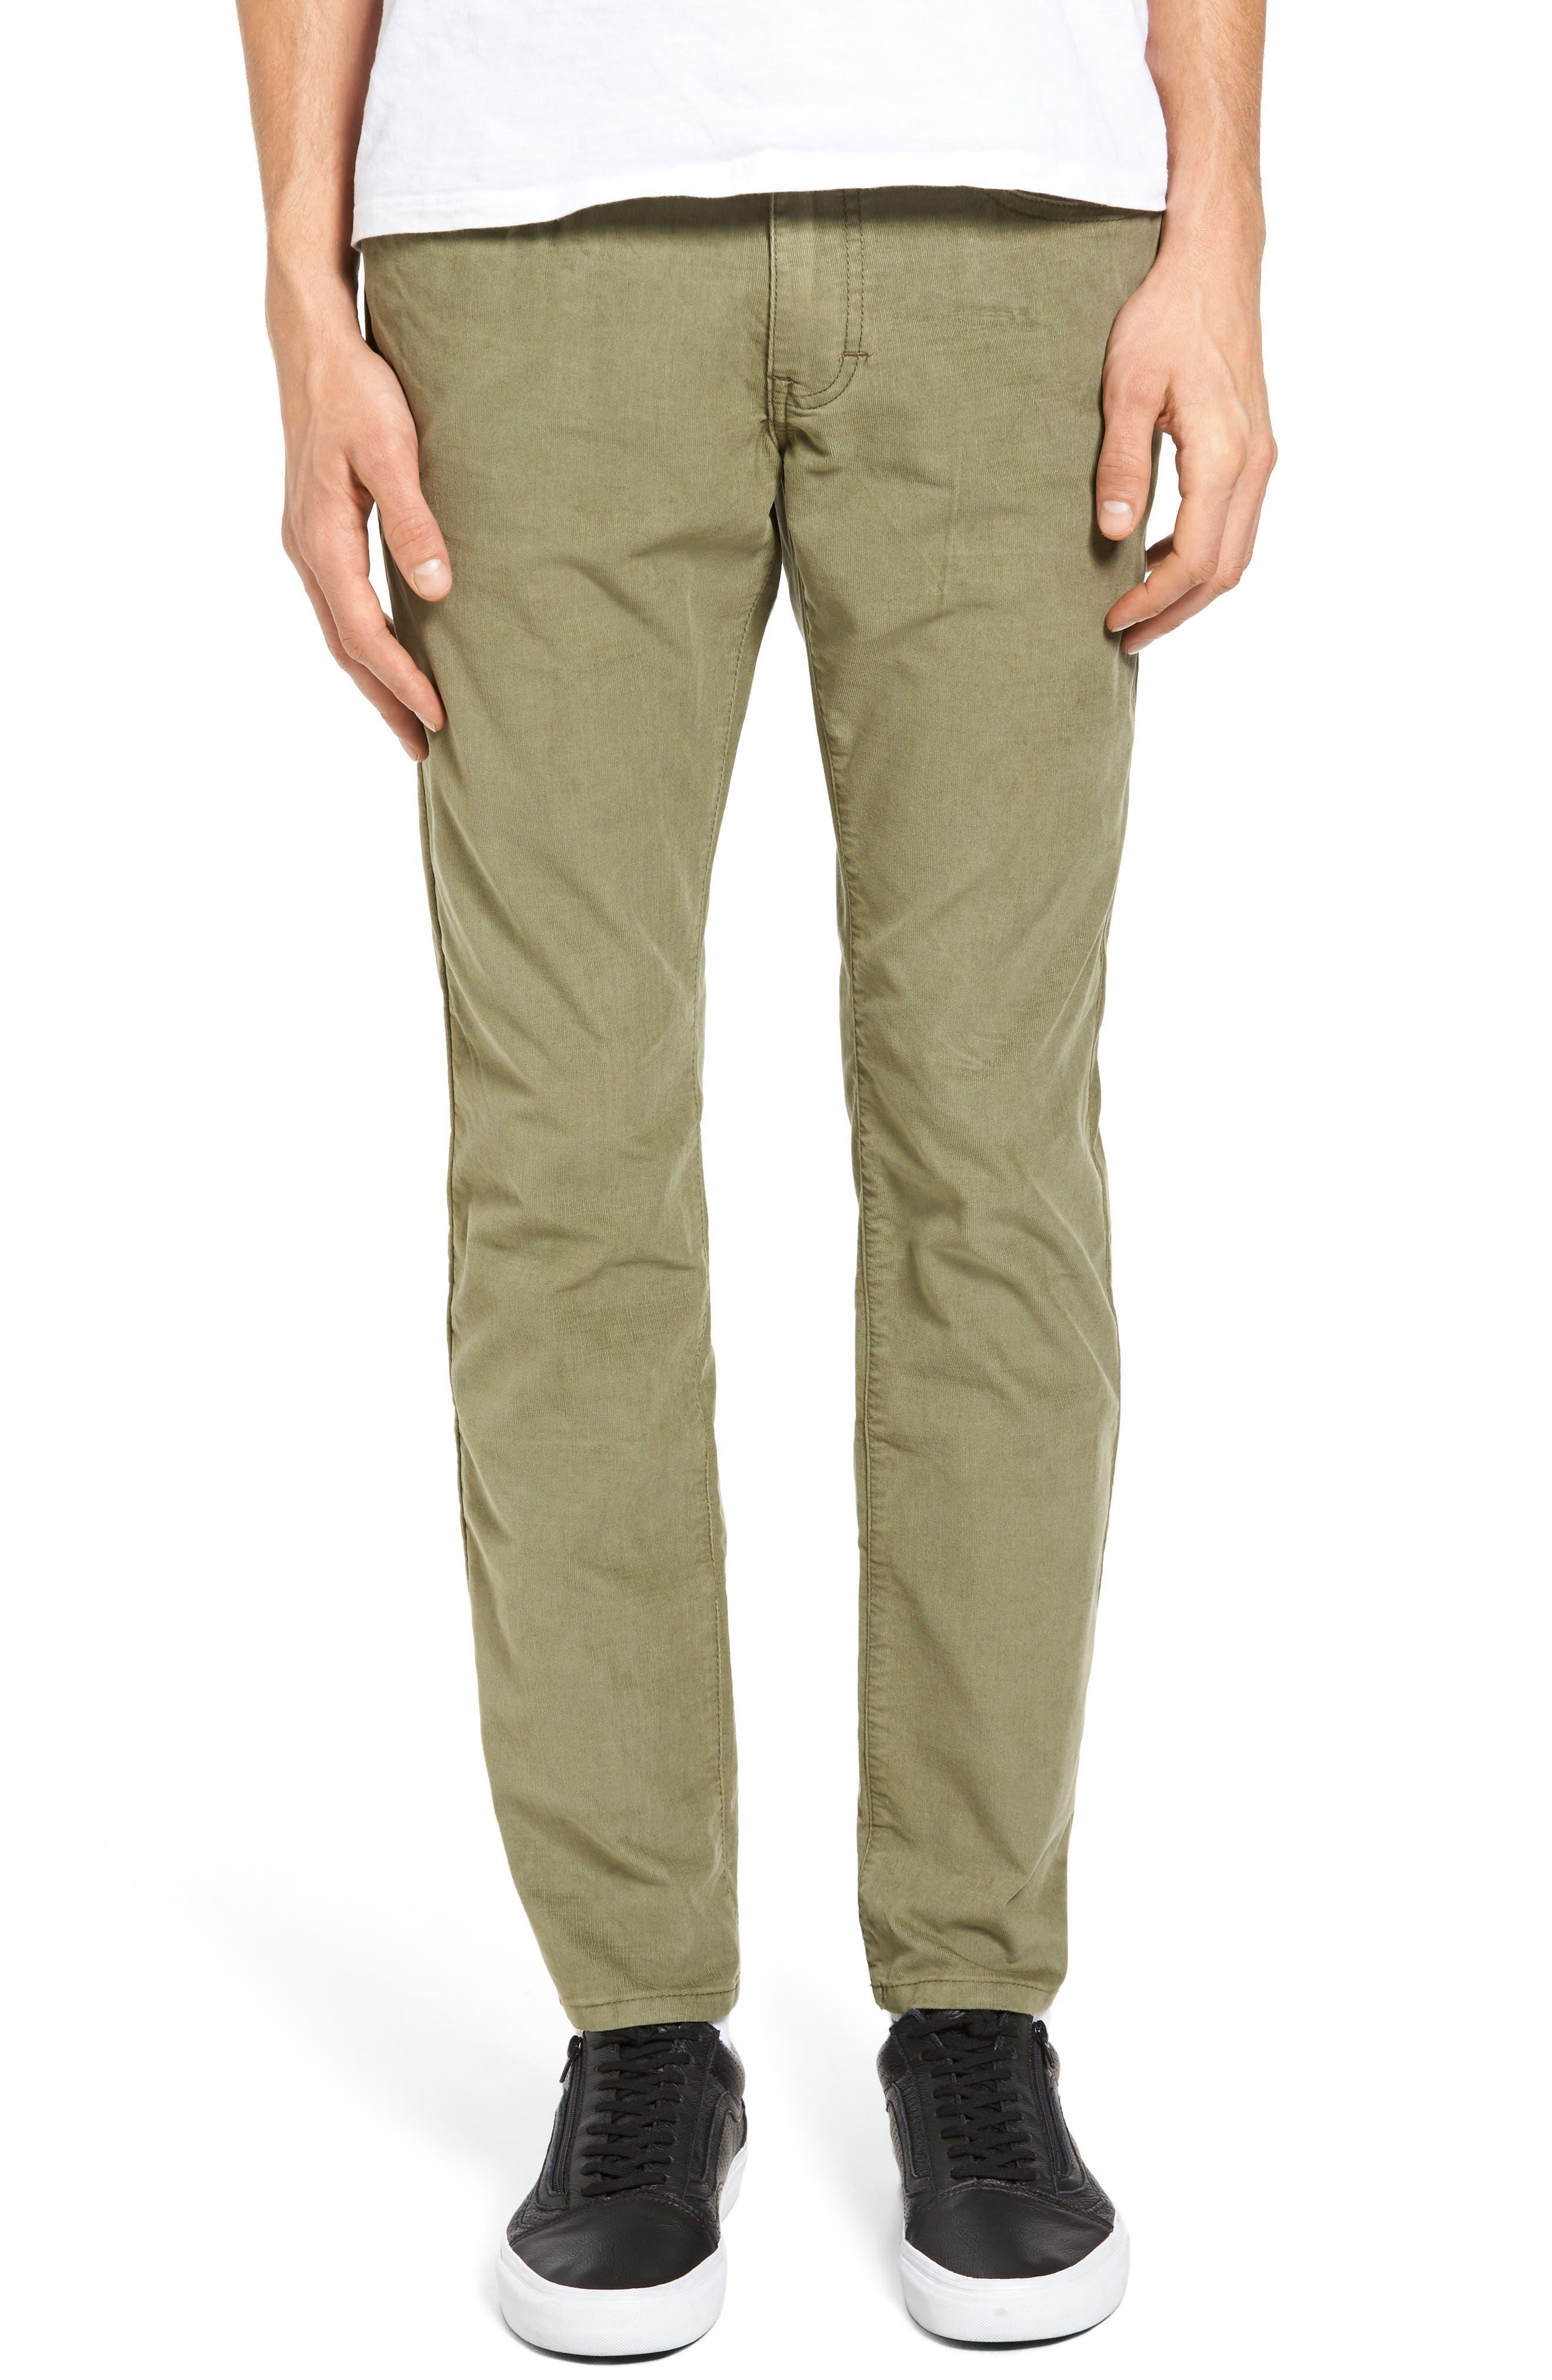 Bryce Chopper Slim Fit Corduroy Pants,                             Alternate thumbnail 2, color,                             302